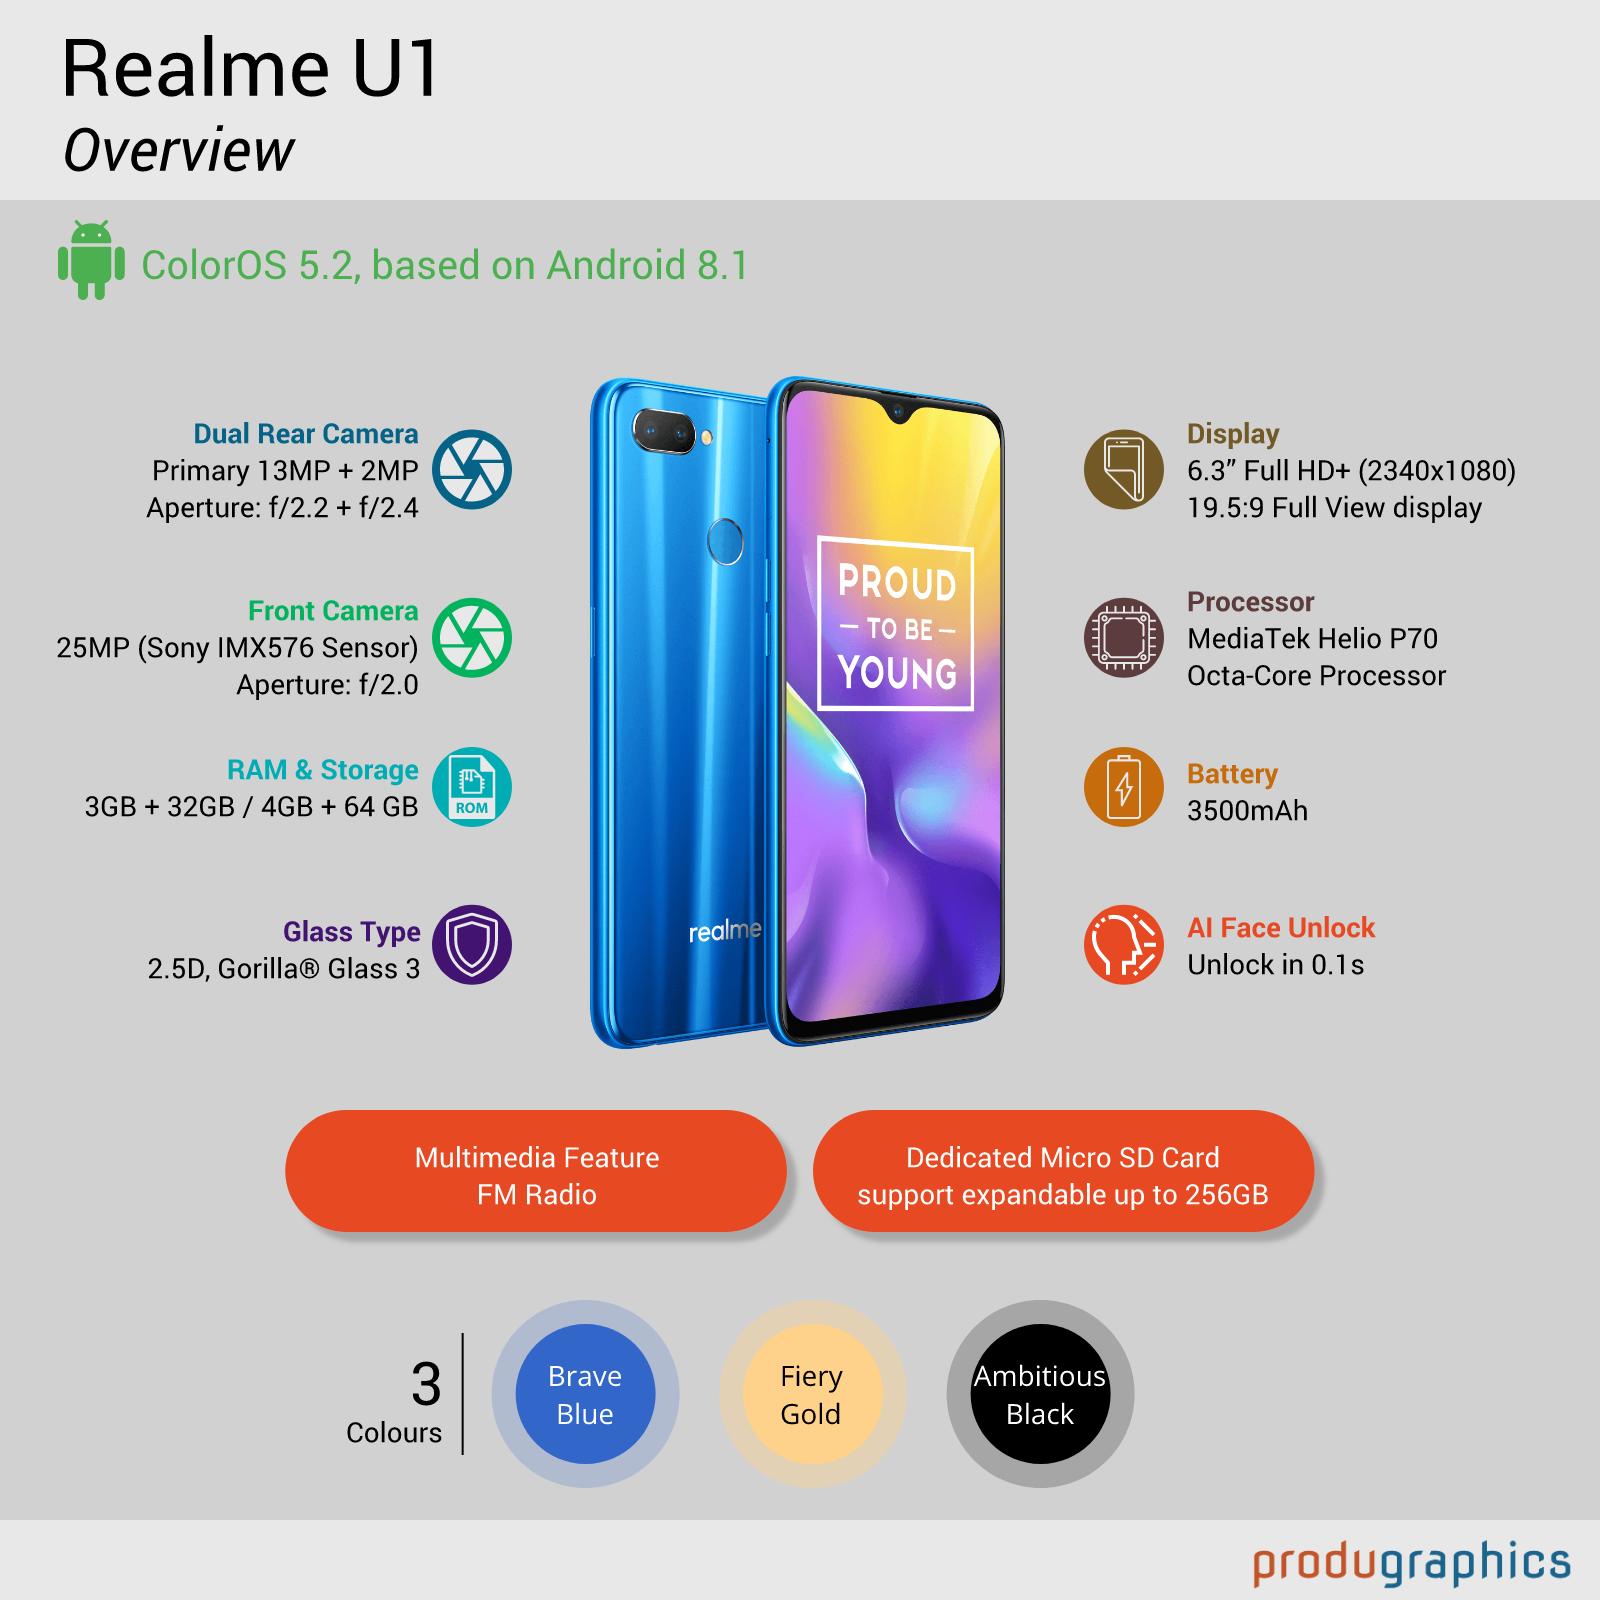 Realme U1 - Overview